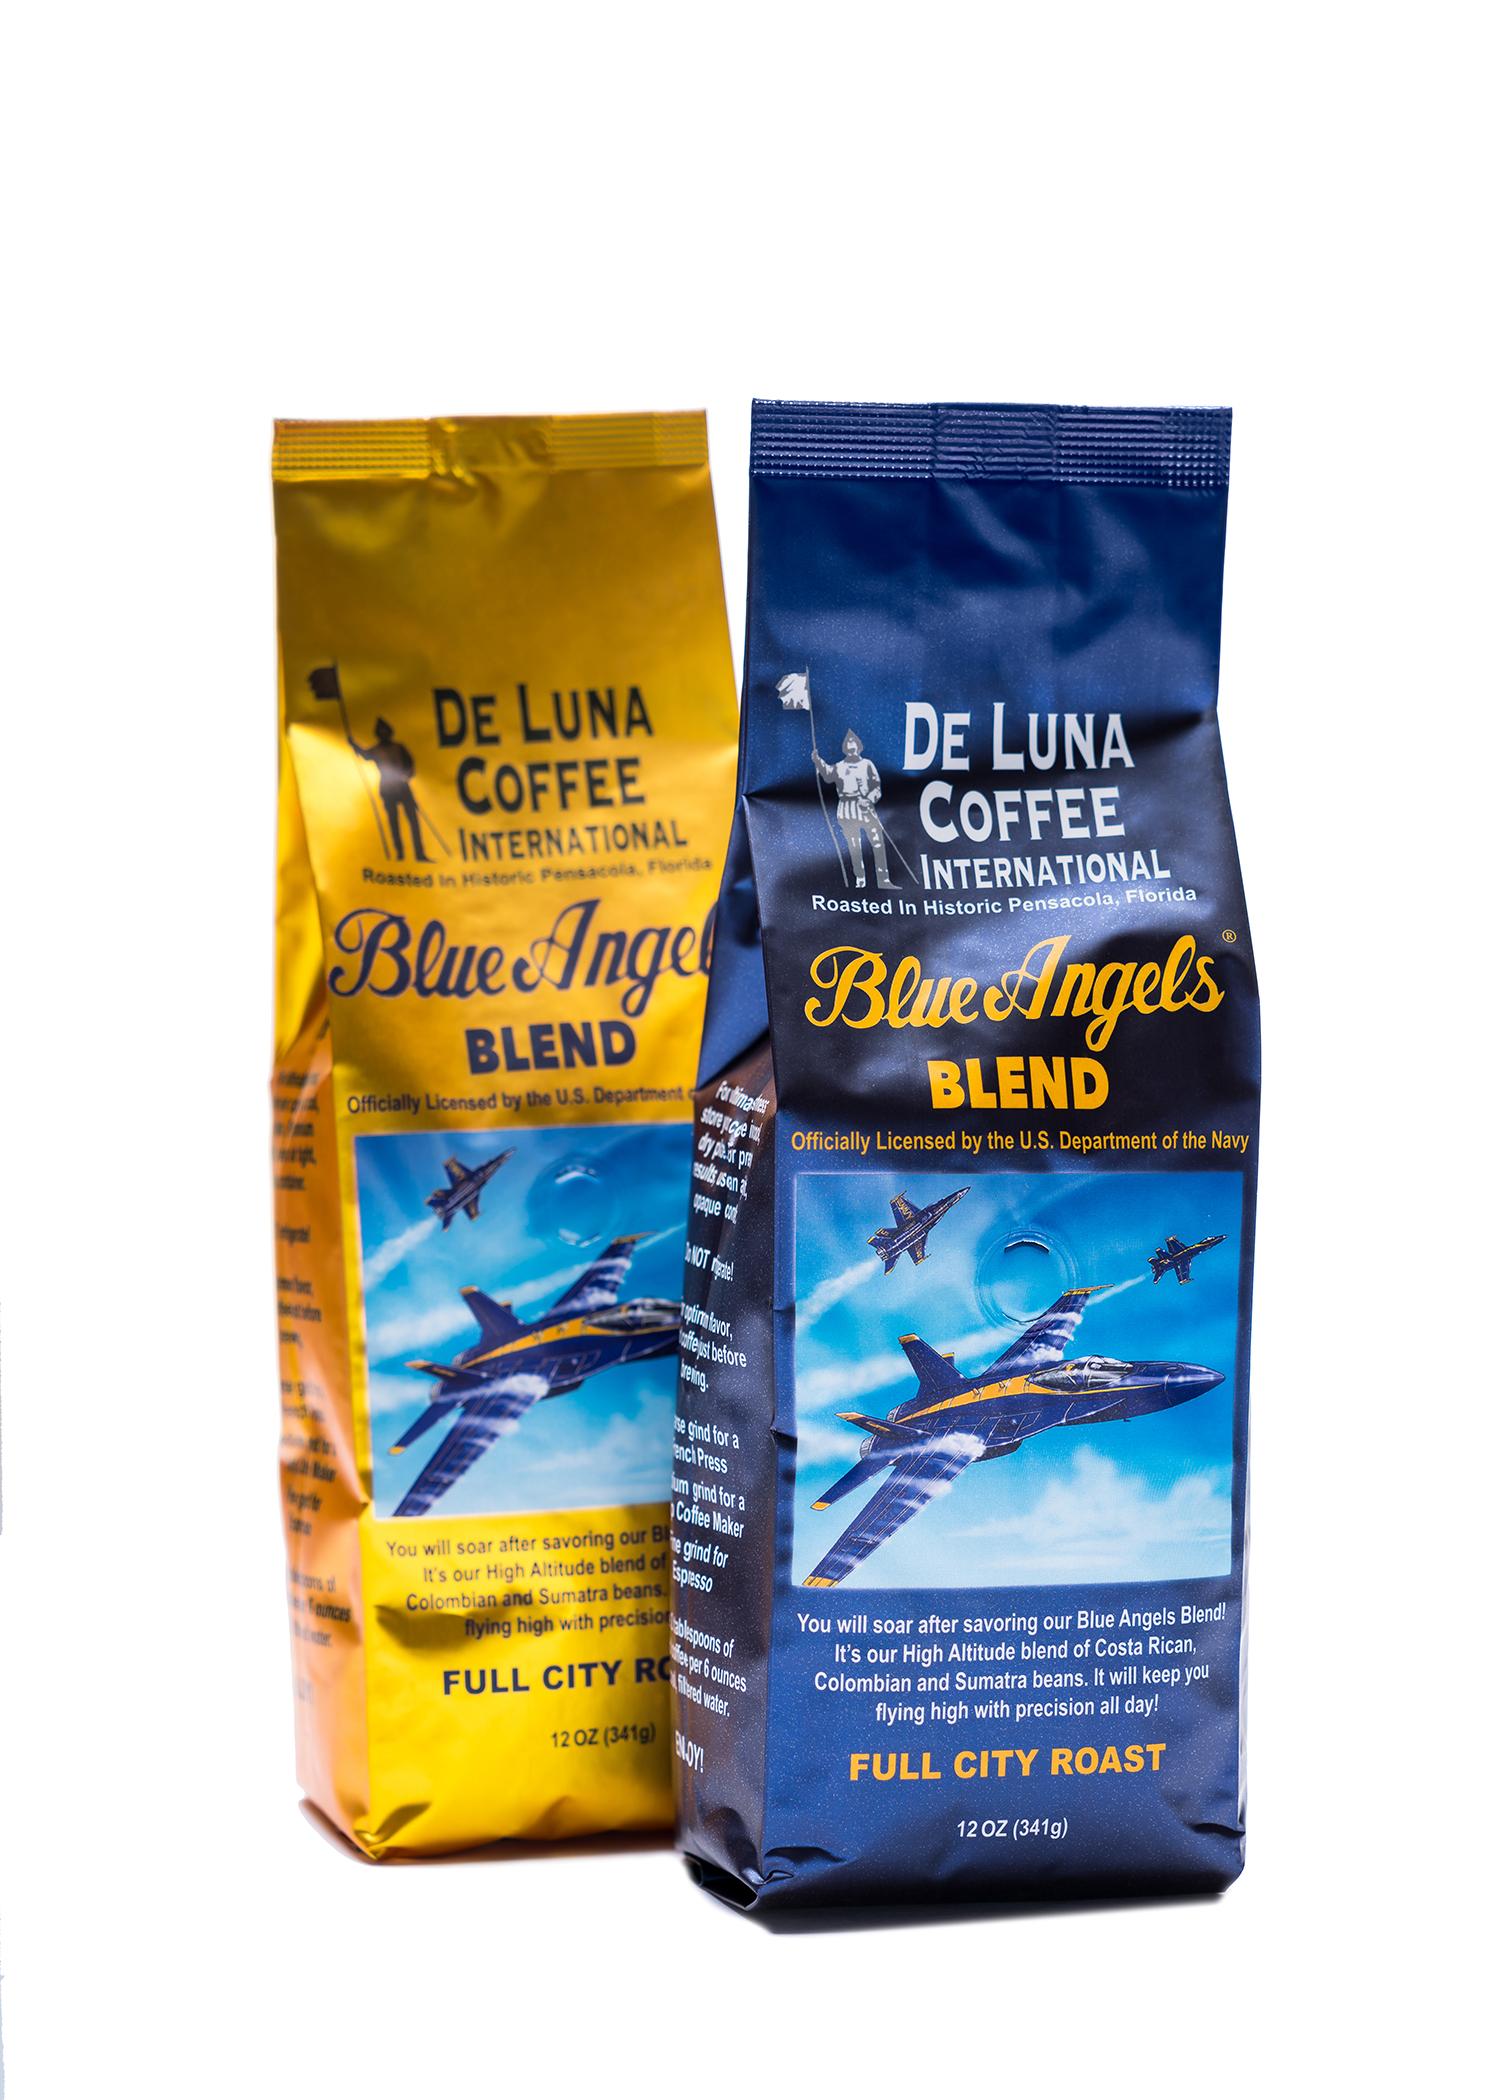 Pensacola Blue Angels coffee goes international